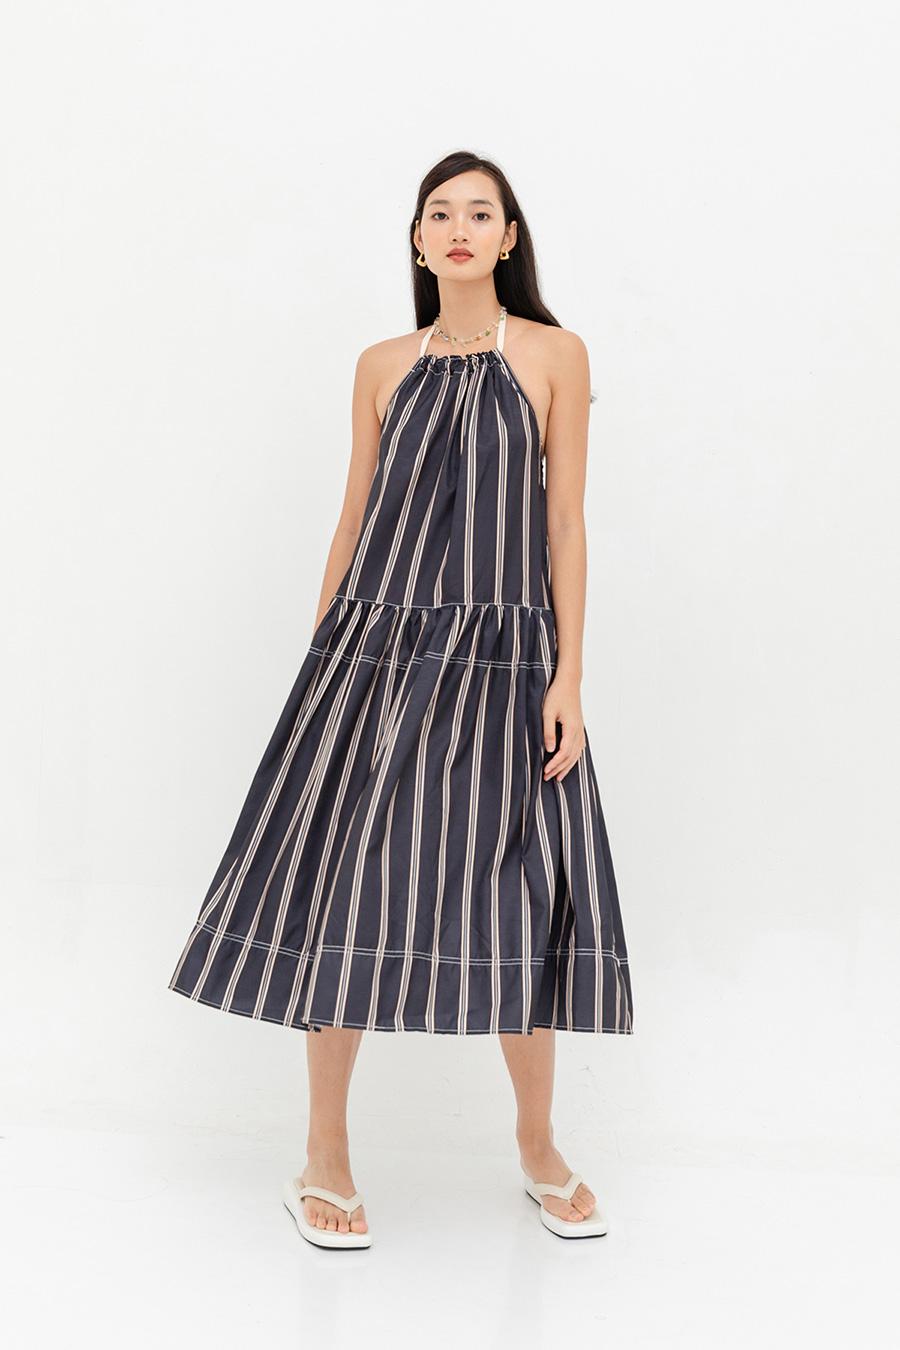 FABRON DRESS - STRIPES